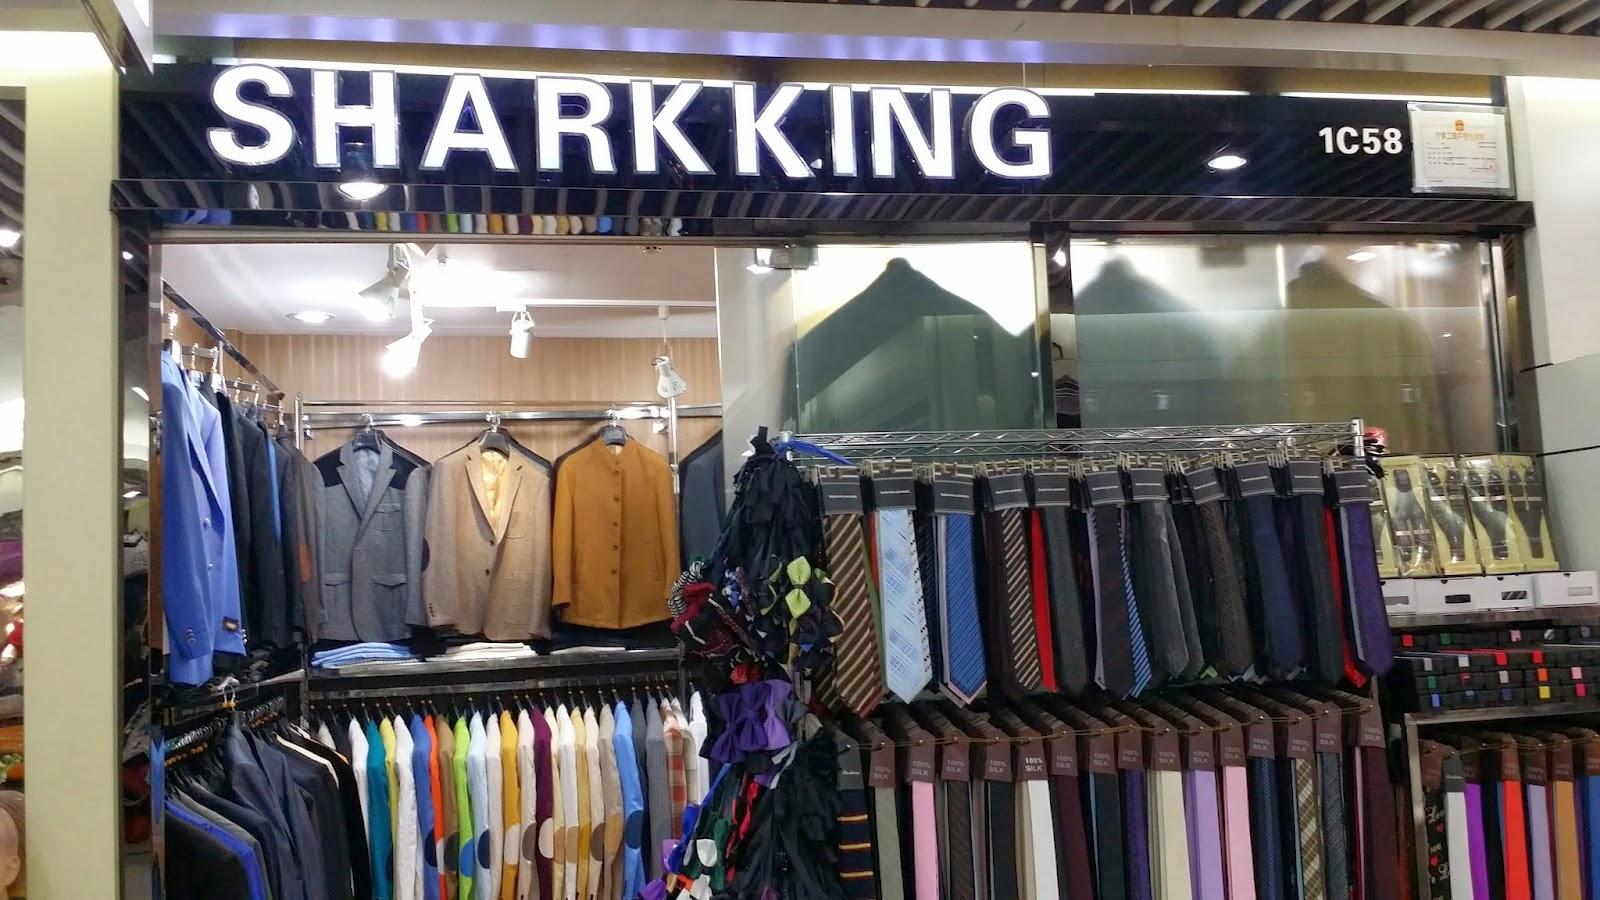 kedai pakaian kasino di st petersburg